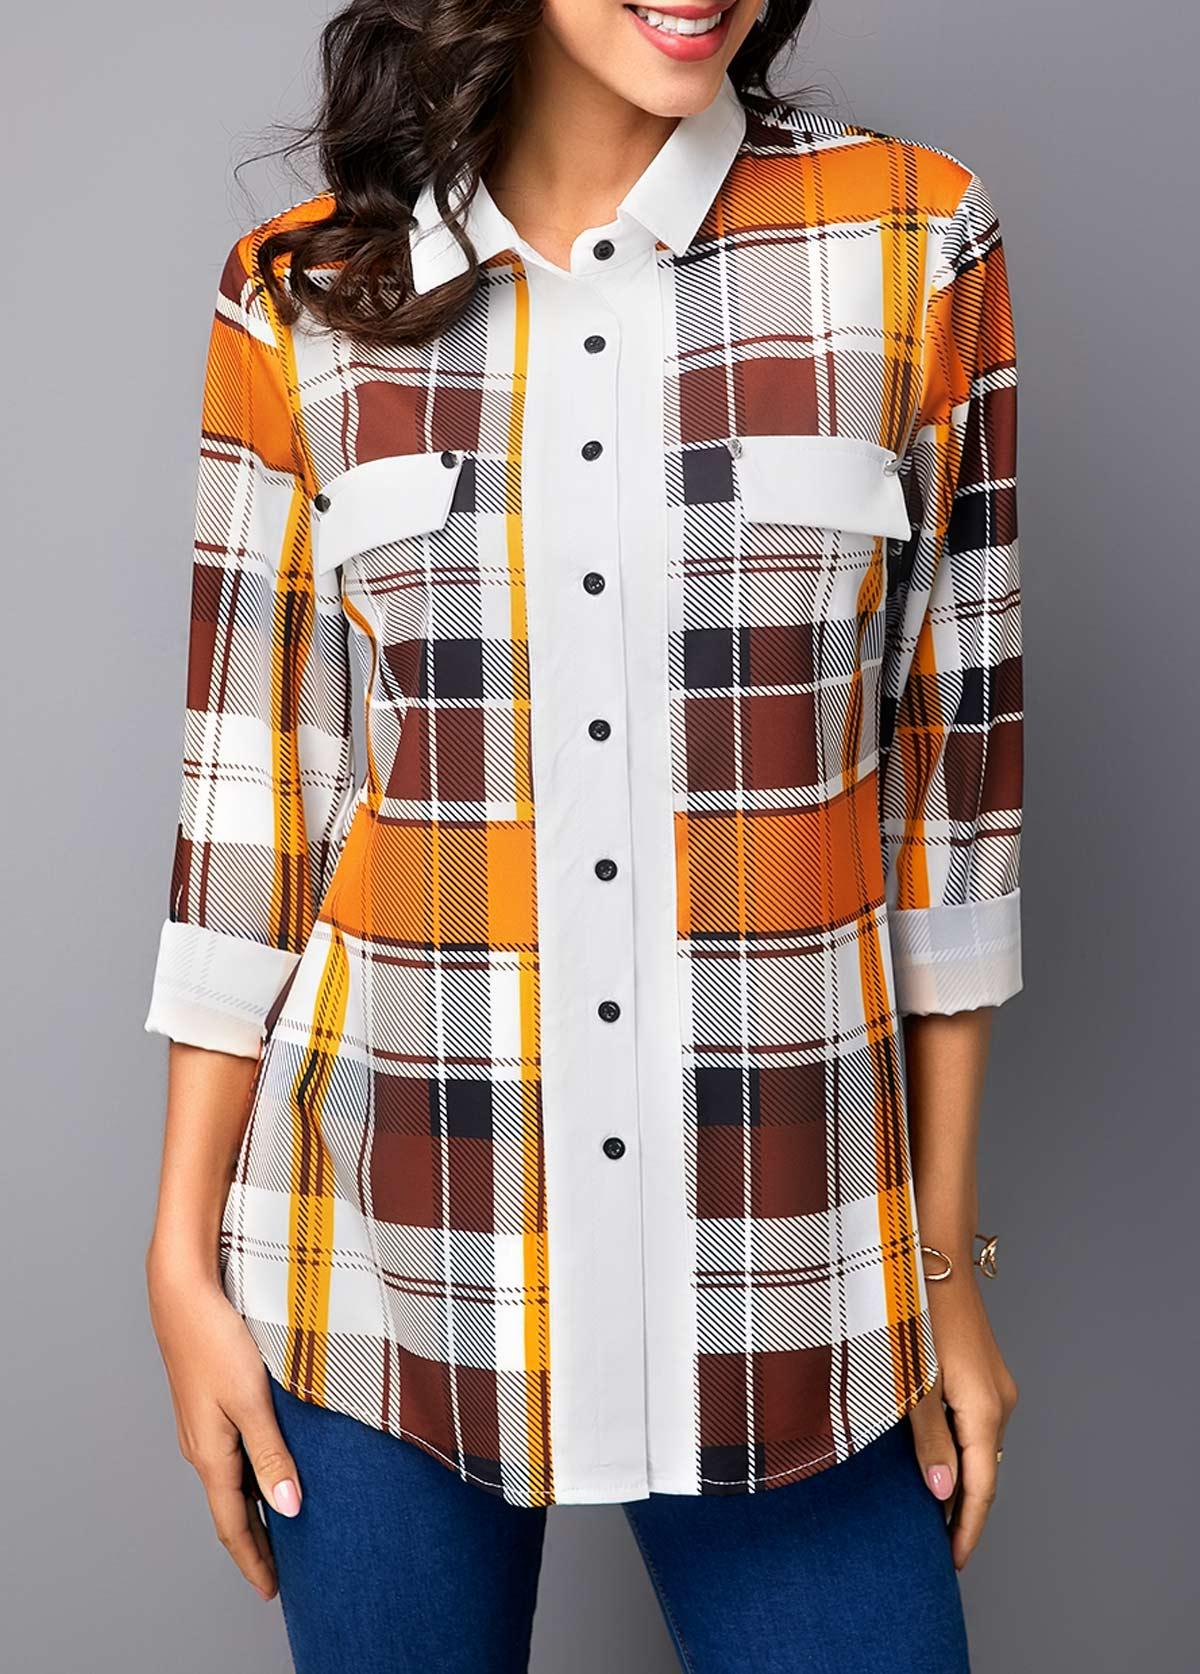 ROTITA Button Up Turndown Collar Plaid Print Shirt